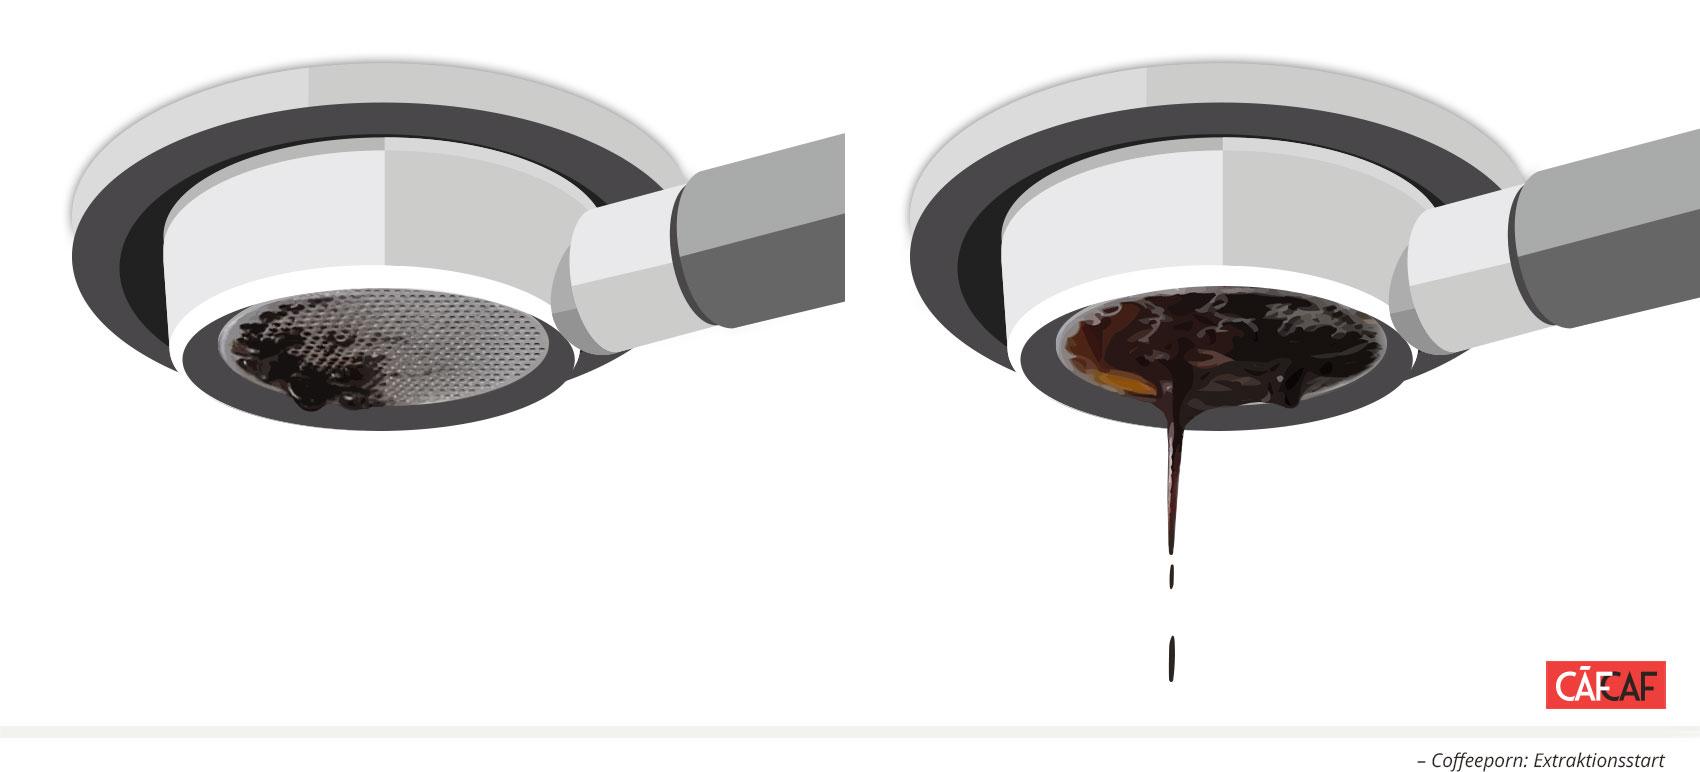 Coffeeporn: Extraktionsstart. CafCaf – Kaffee & Blog, Kaffeeblog